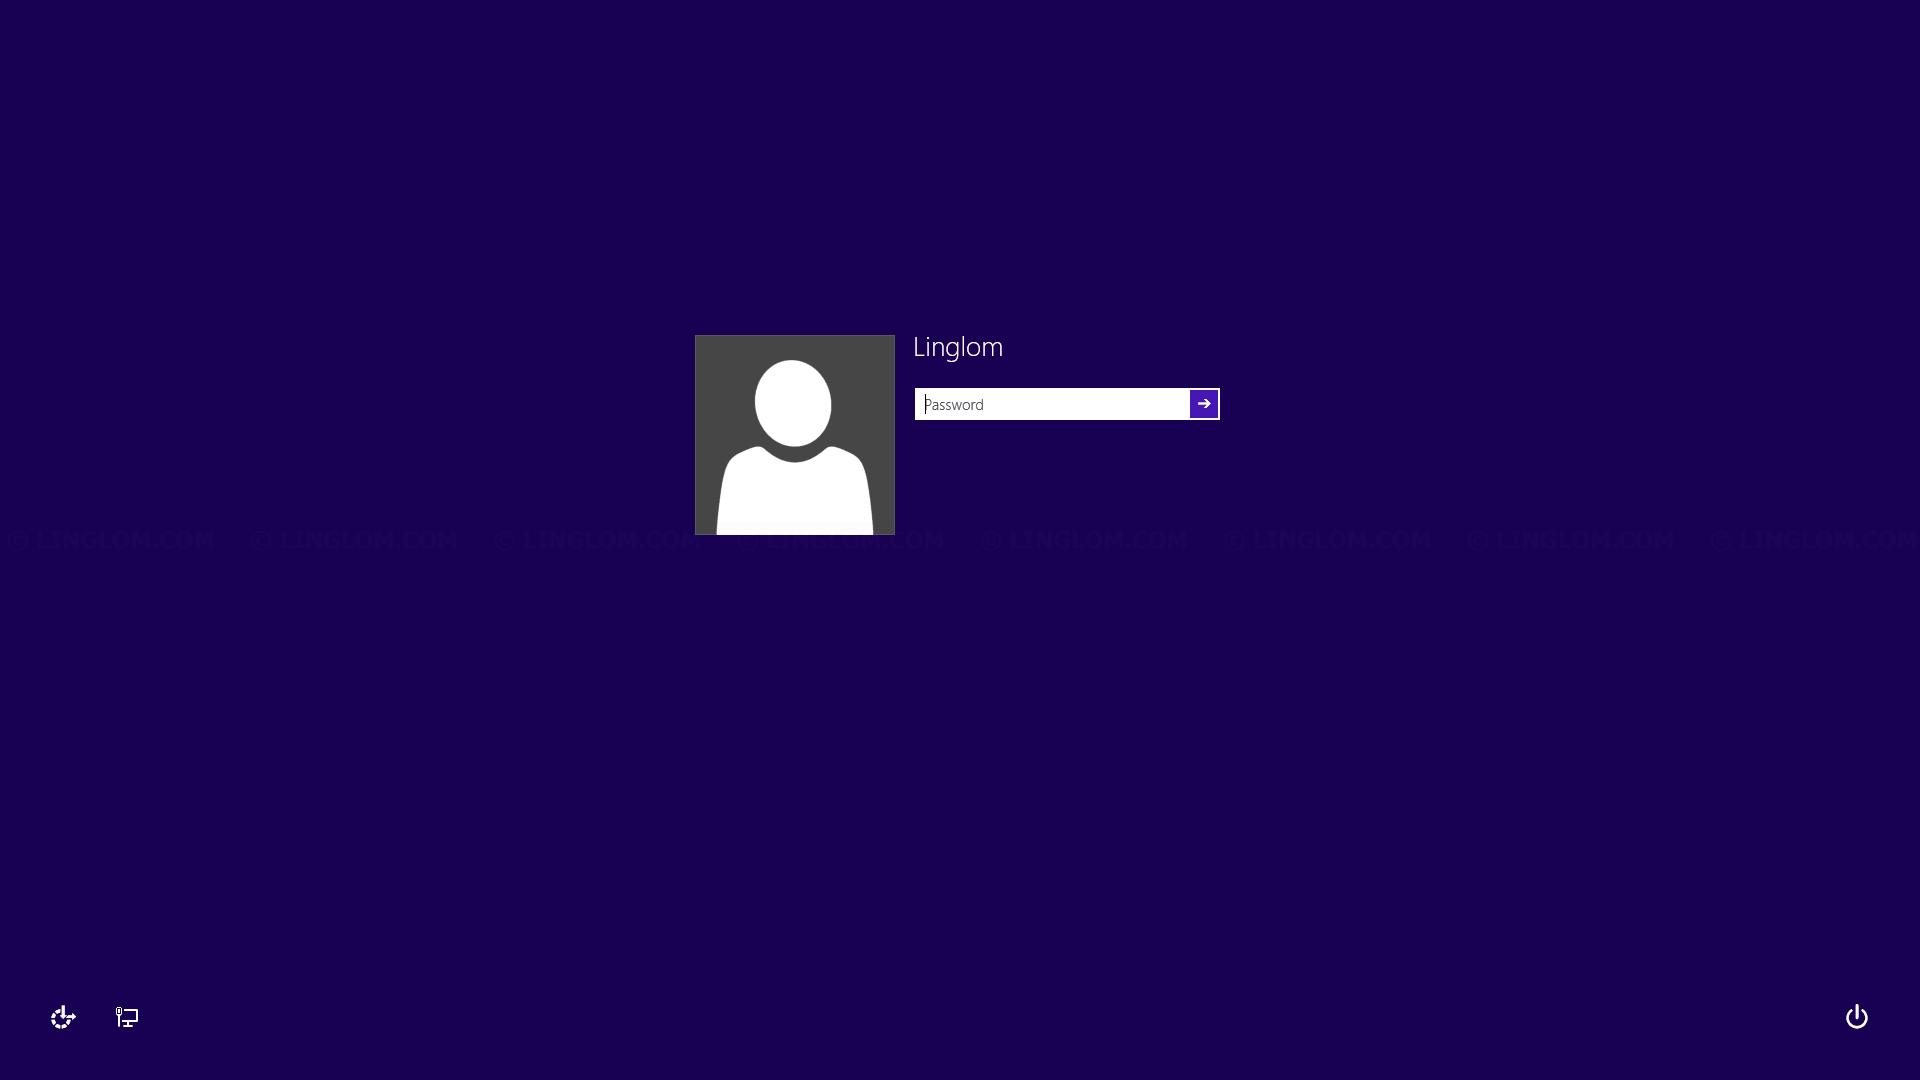 Logon screen on Windows 8.1